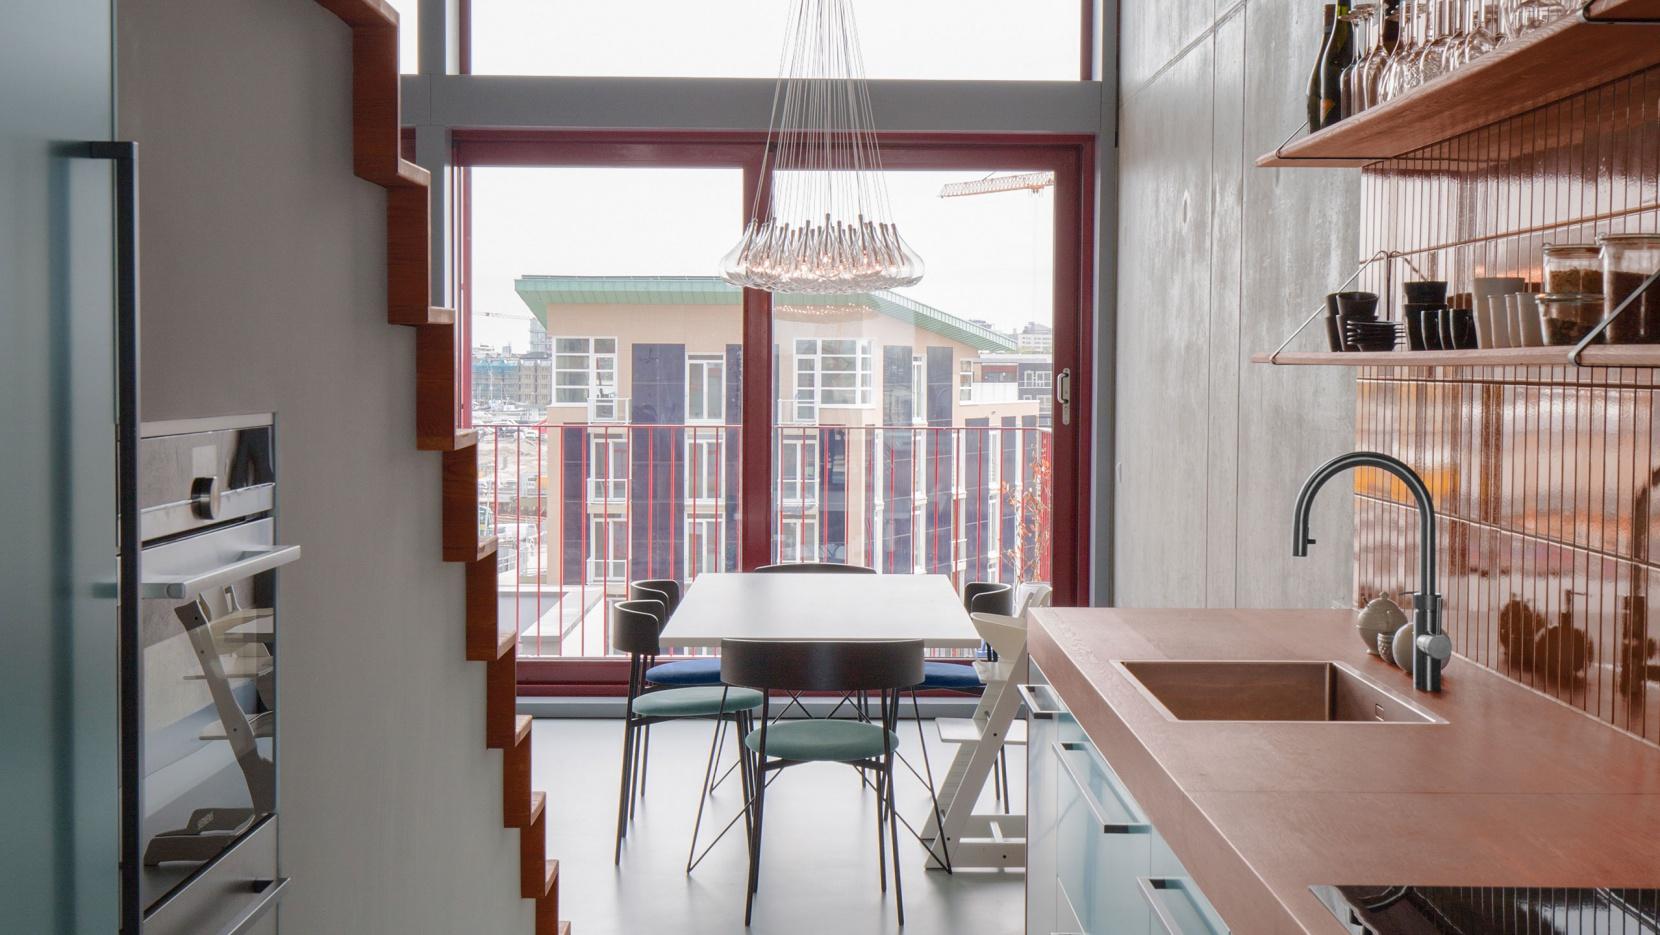 Interior Design Studio Amsterdam superlofts: modern living in amsterdam's houthaven